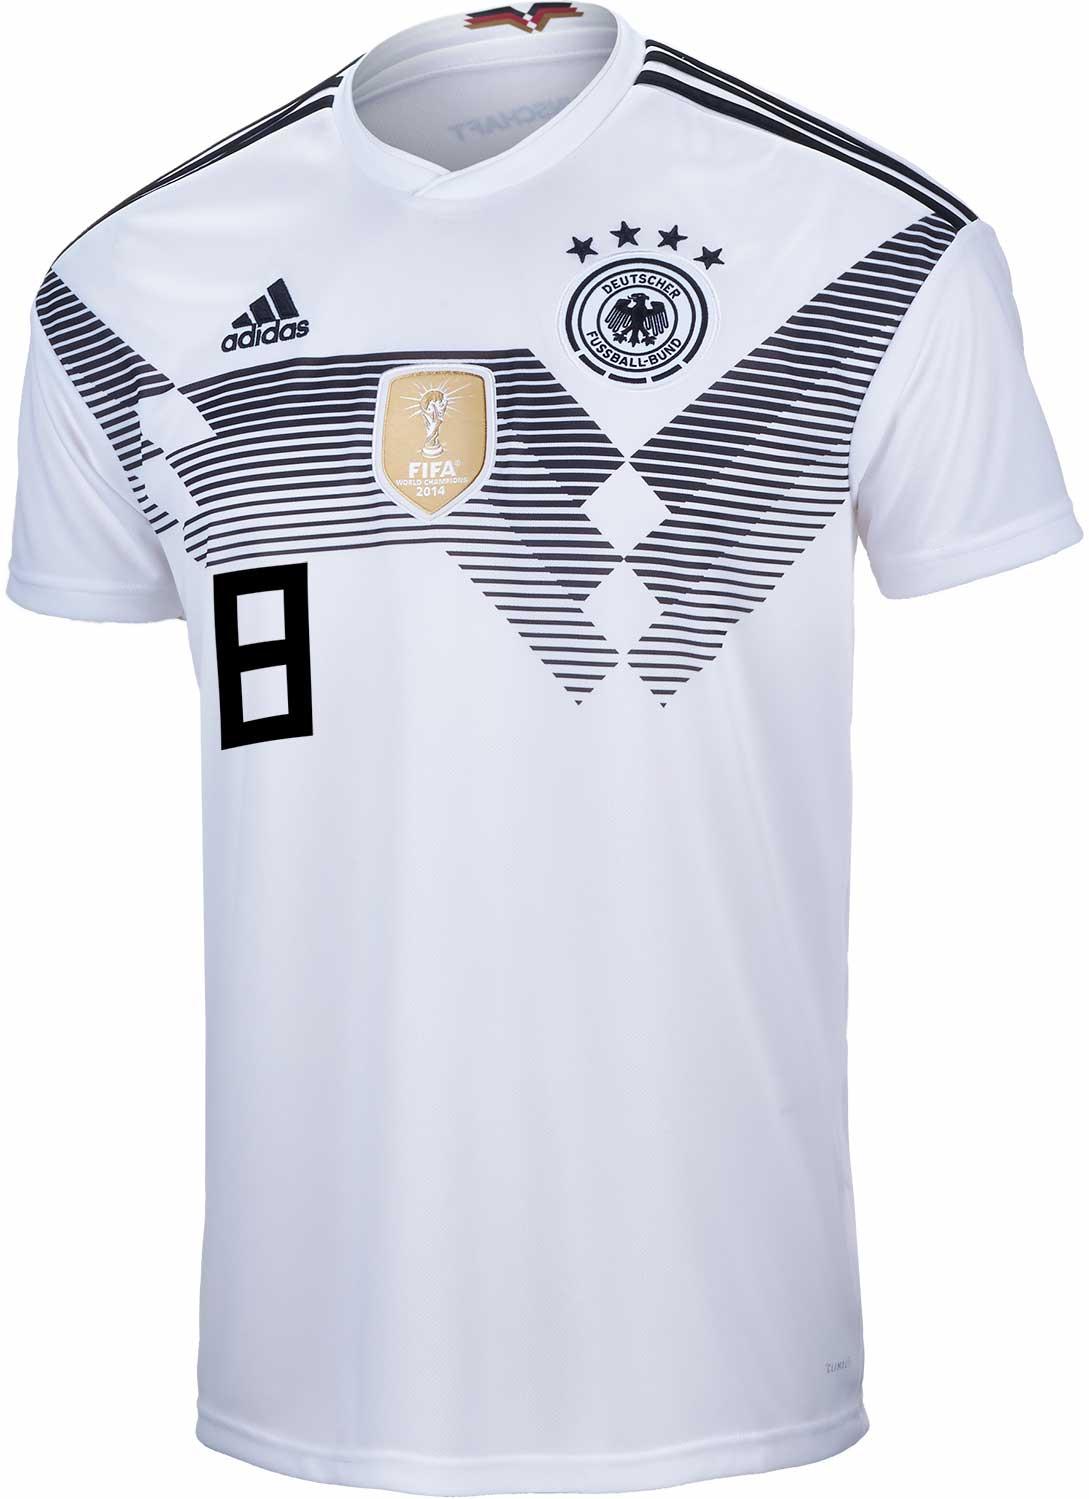 buy popular 0d19f c2e45 adidas Kids Toni Kroos Germany Home Jersey 2018-19 - SoccerPro